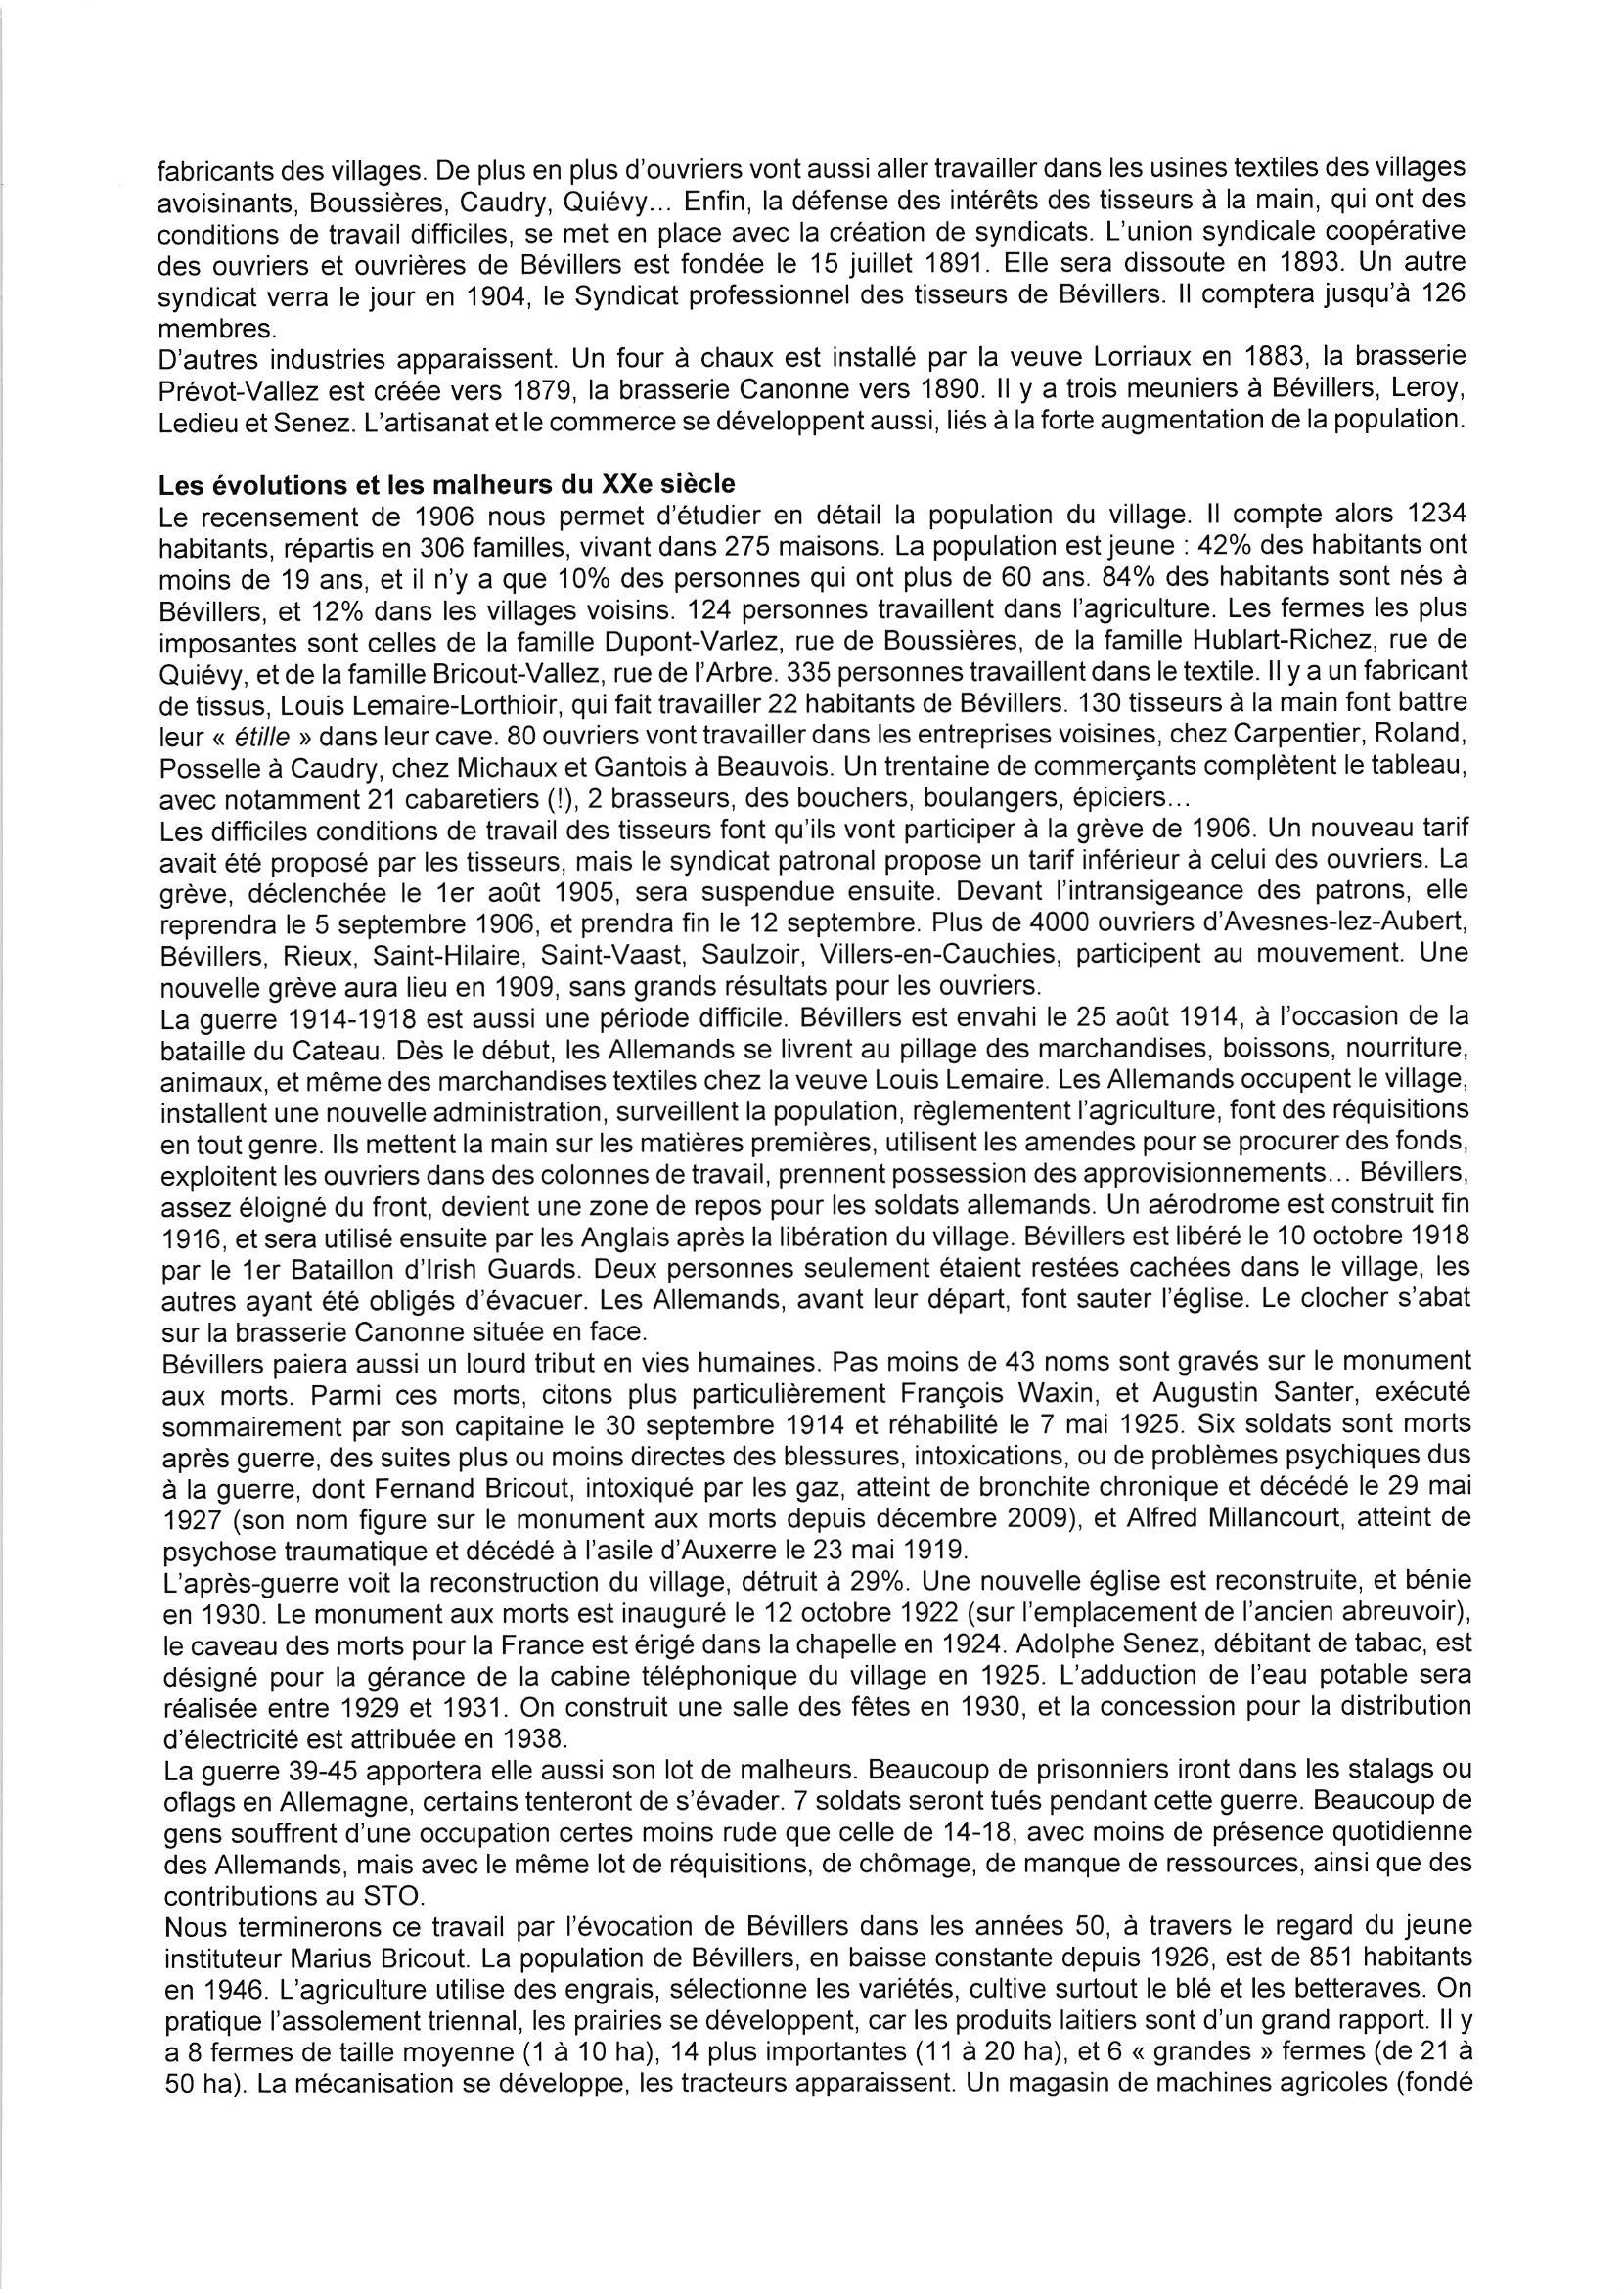 histoire-de-bevillers-4